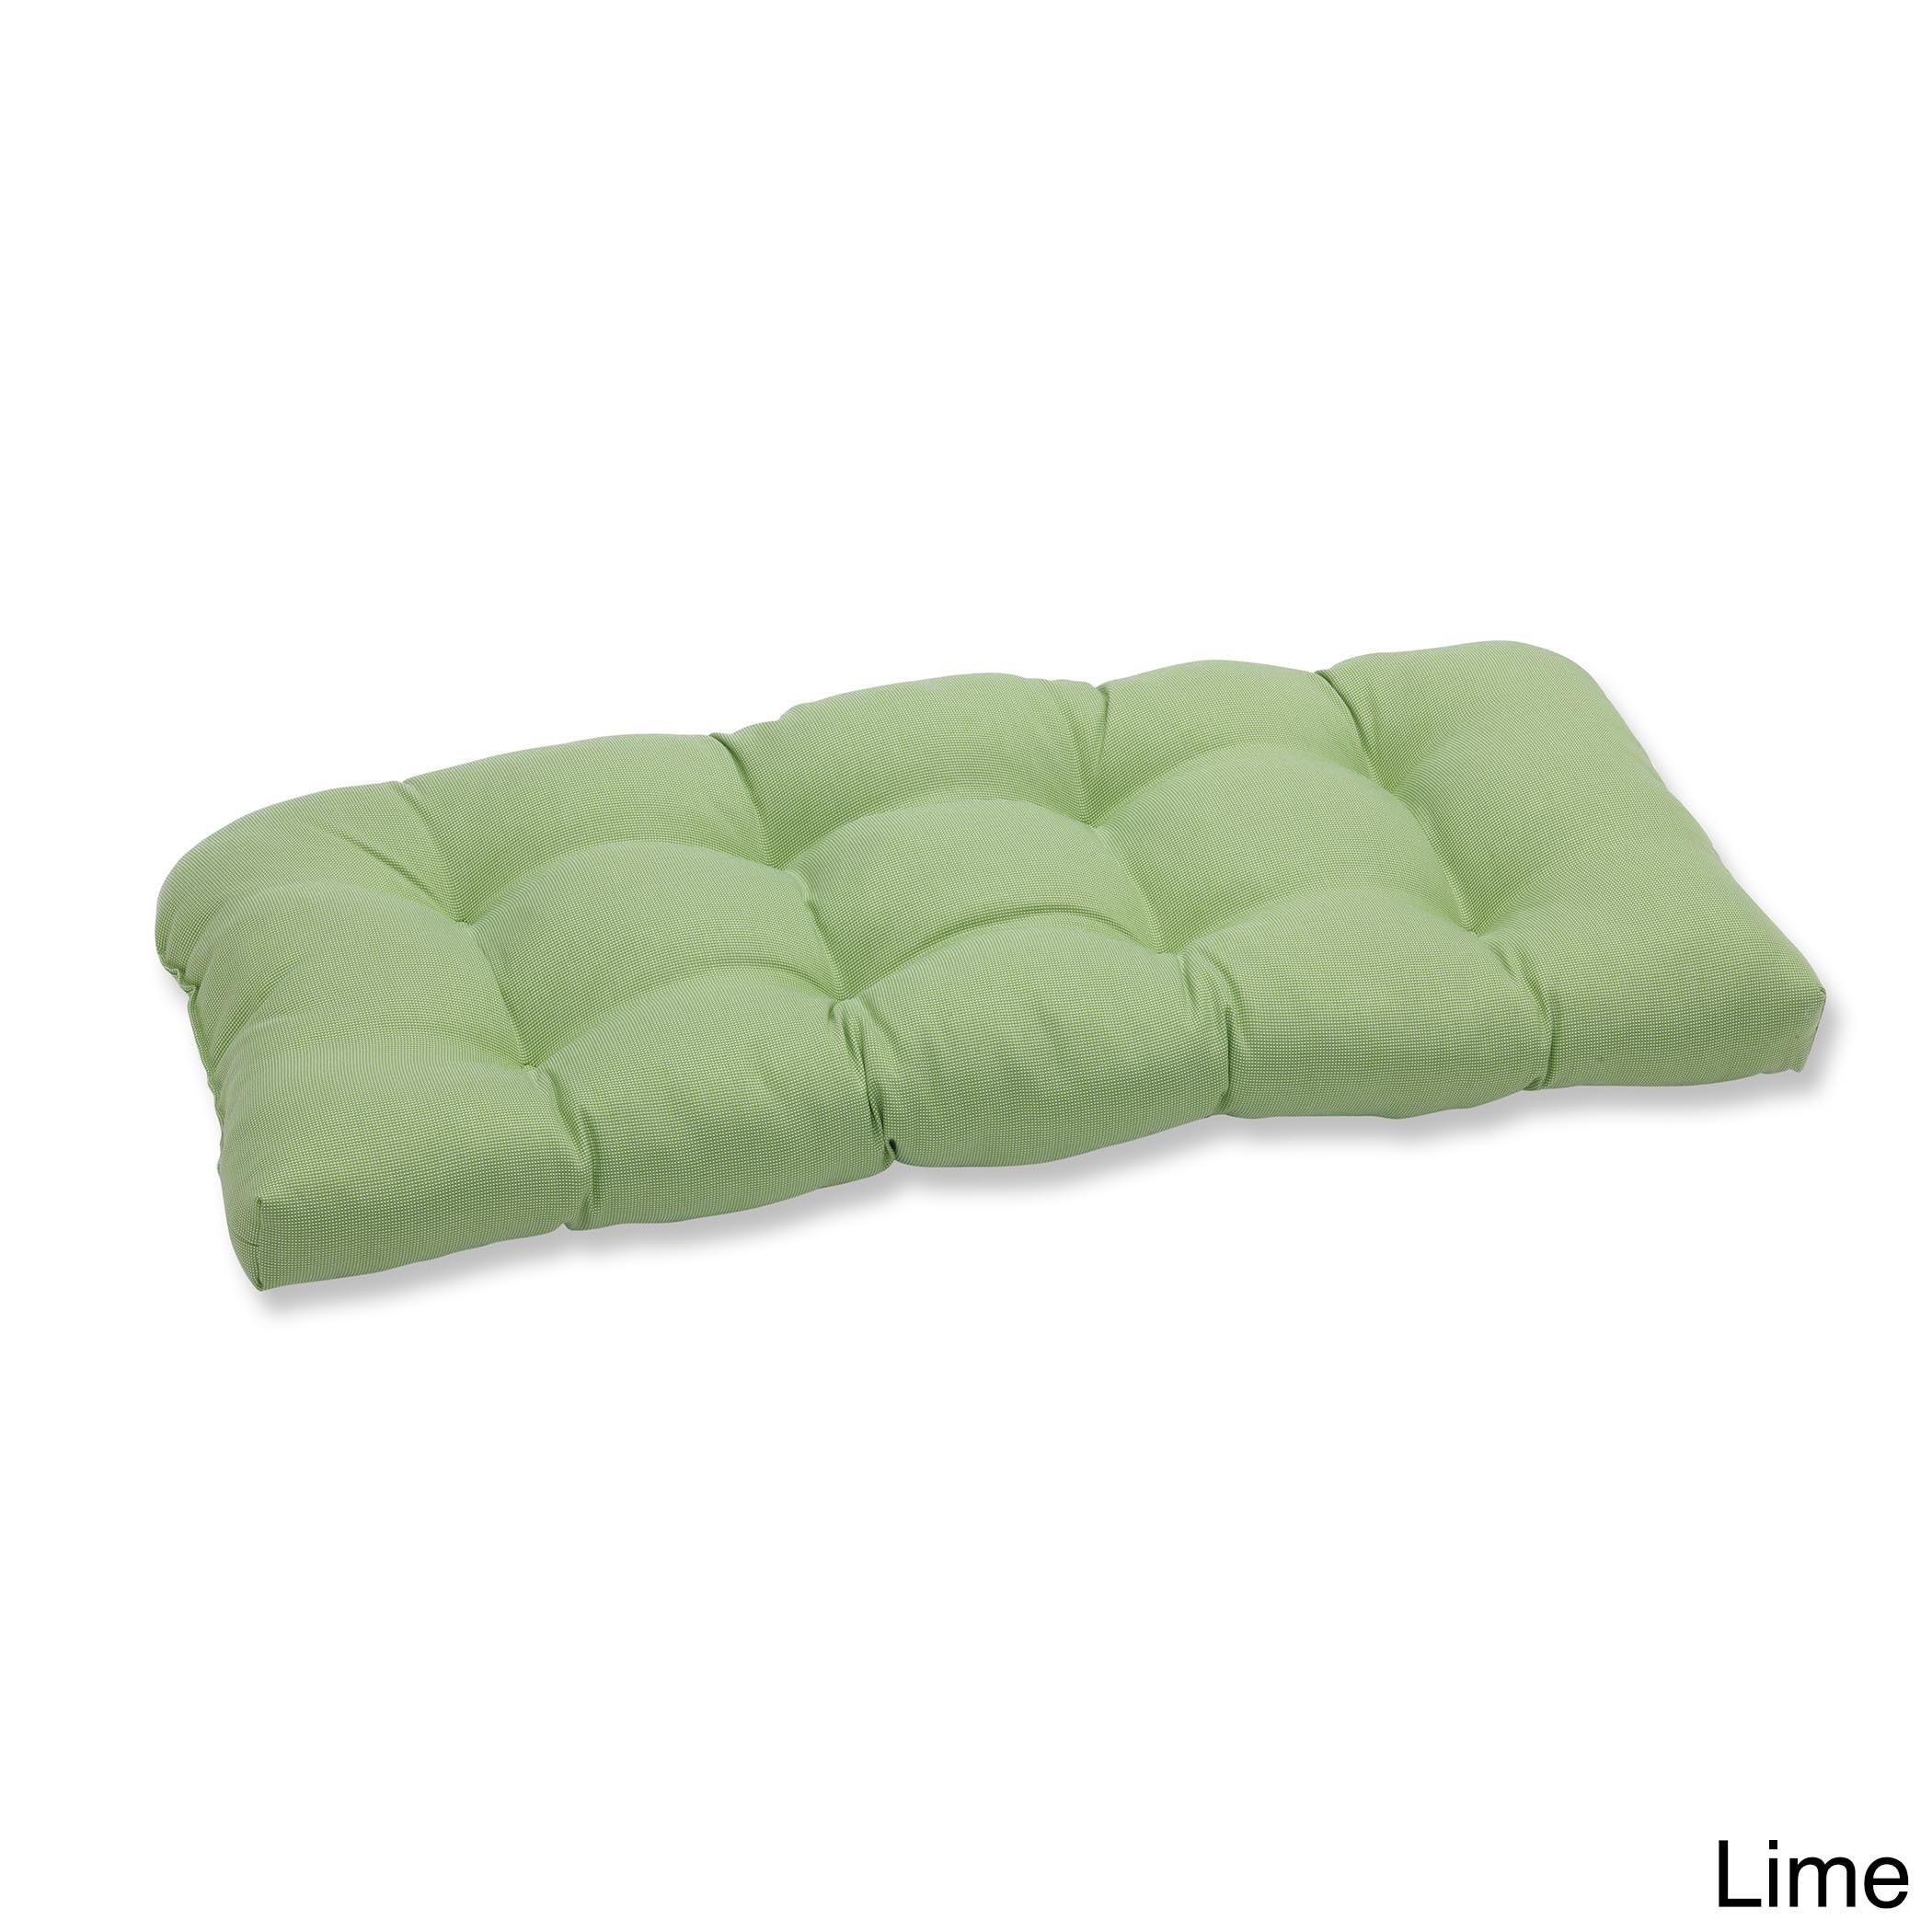 Pillow Indoor outdoor Tweed Lime Wicker Loveseat Cushion